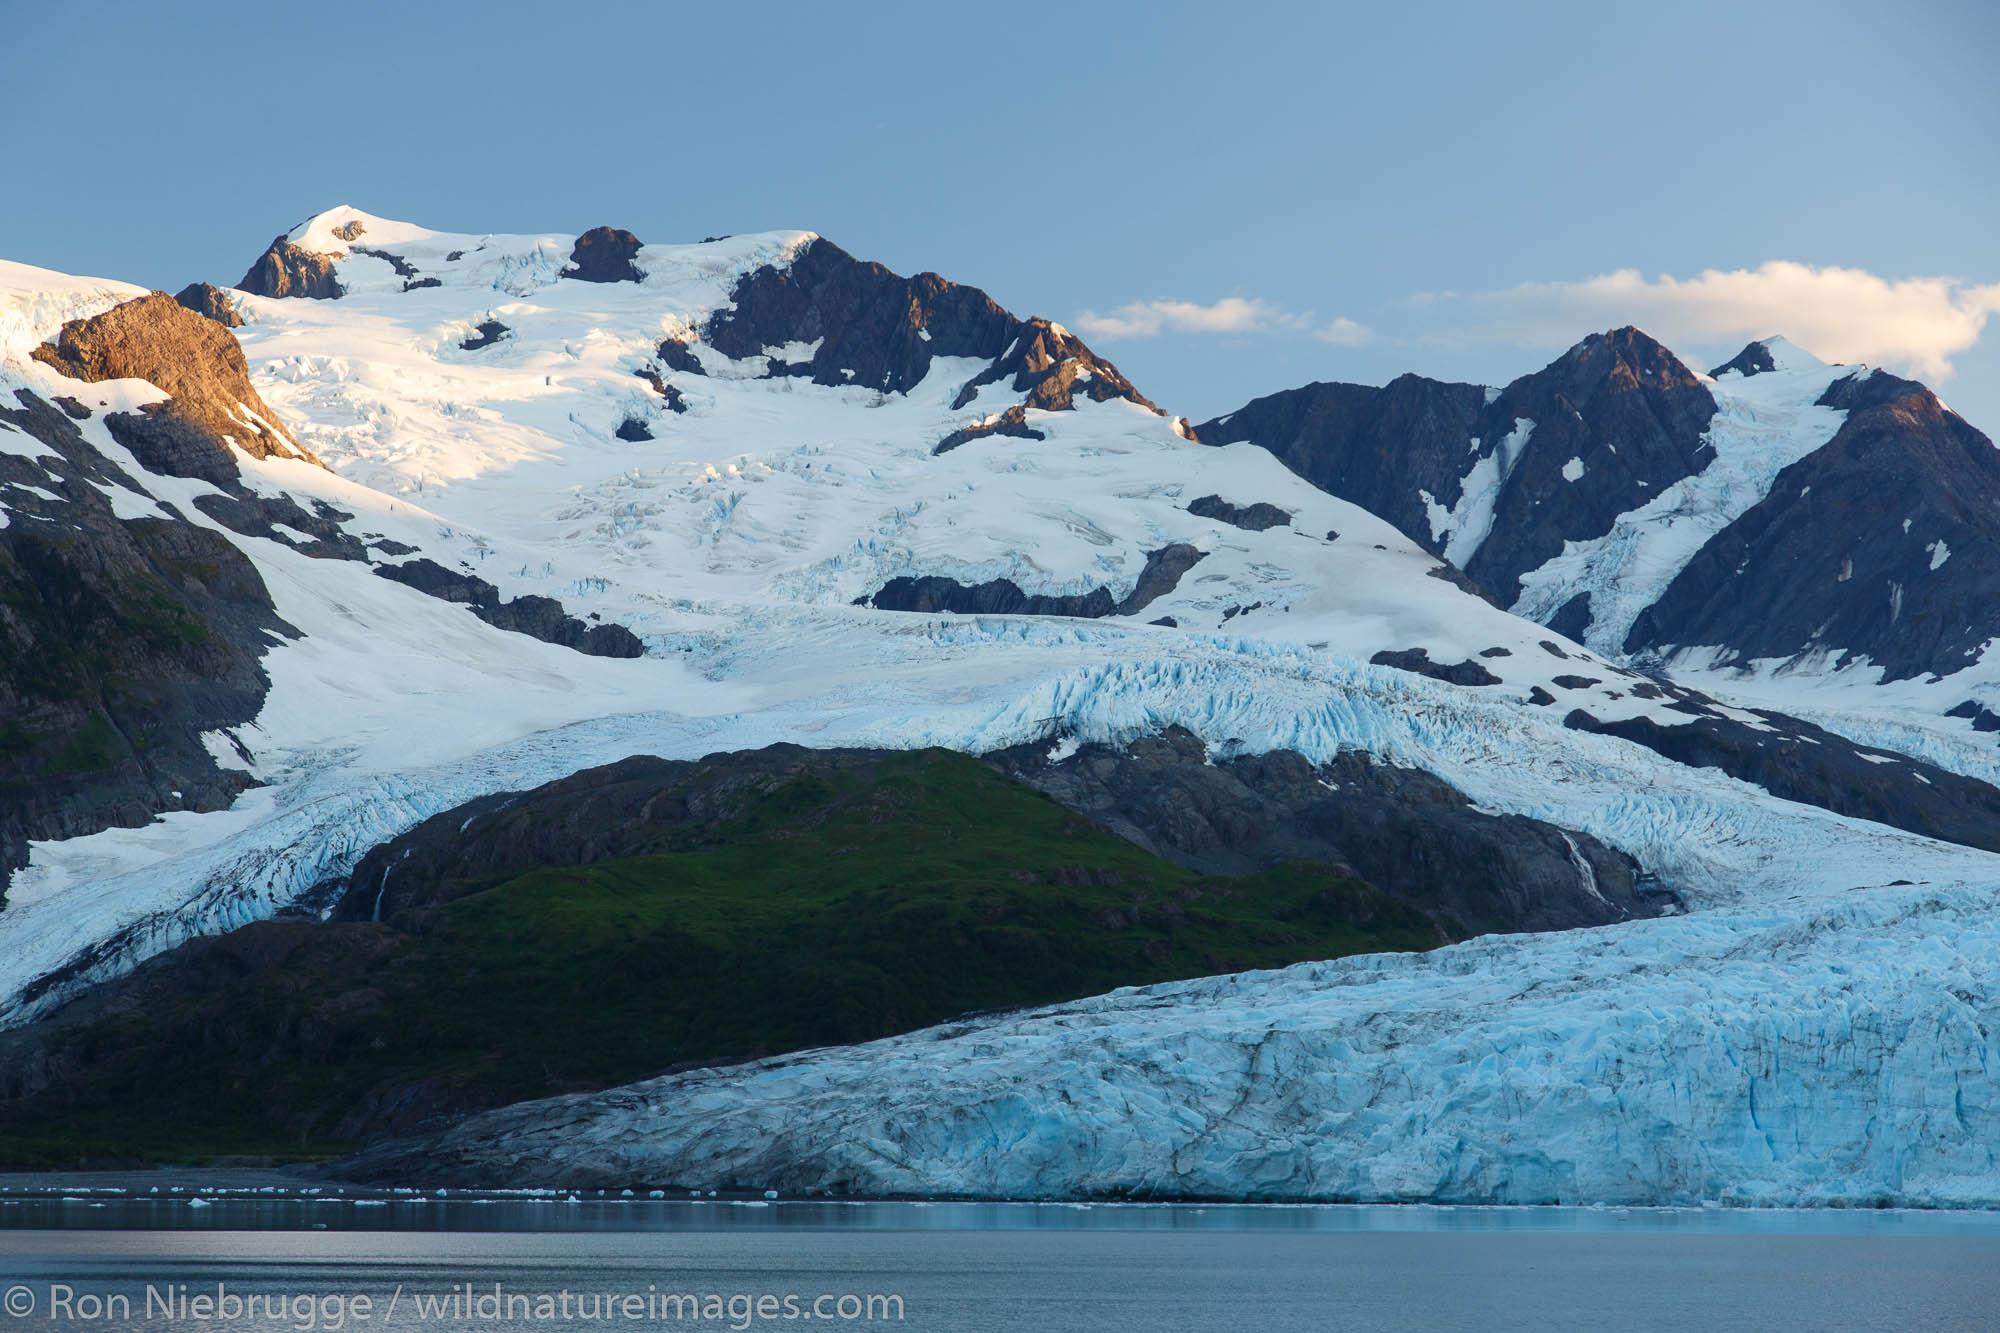 Harriman Glacier and Fjord, Prince William Sound, Chugach National Forest, Alaska.